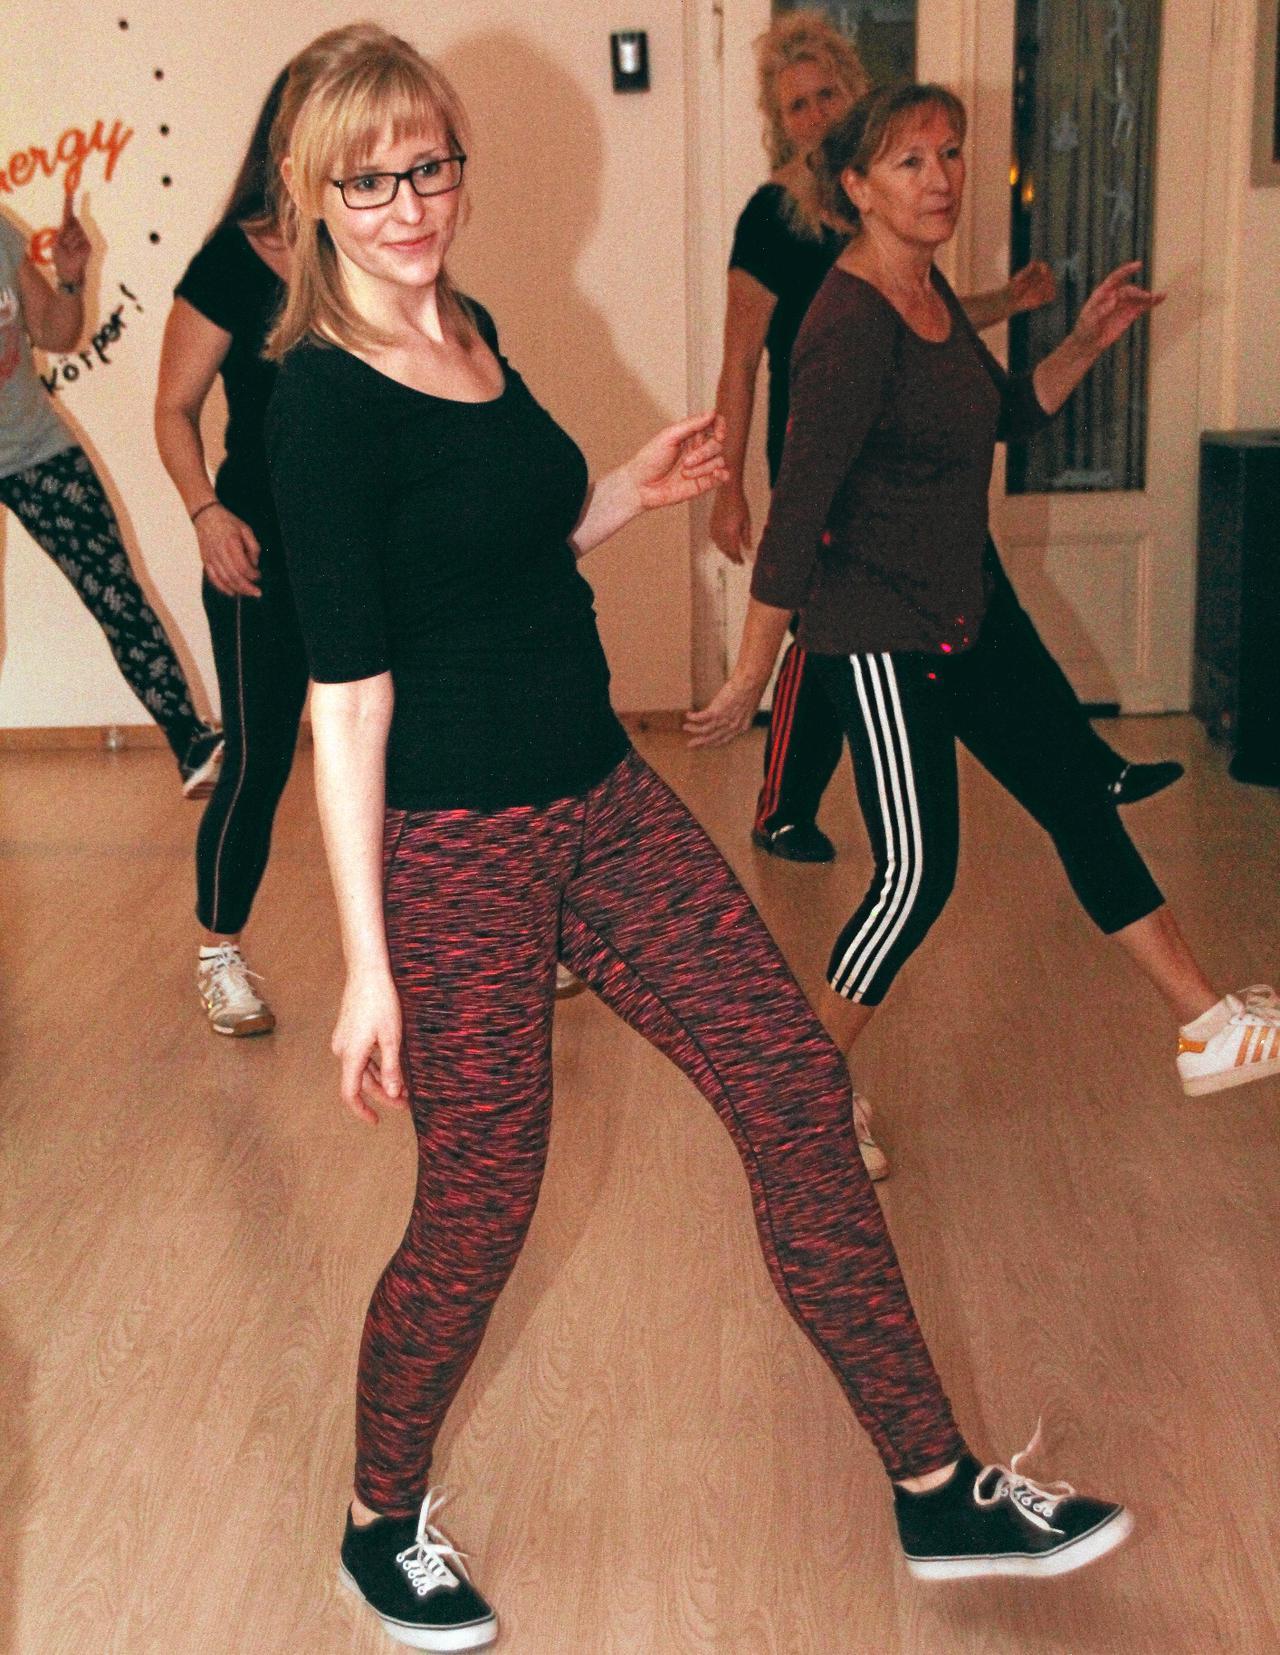 Energy Dance im Selbsttest